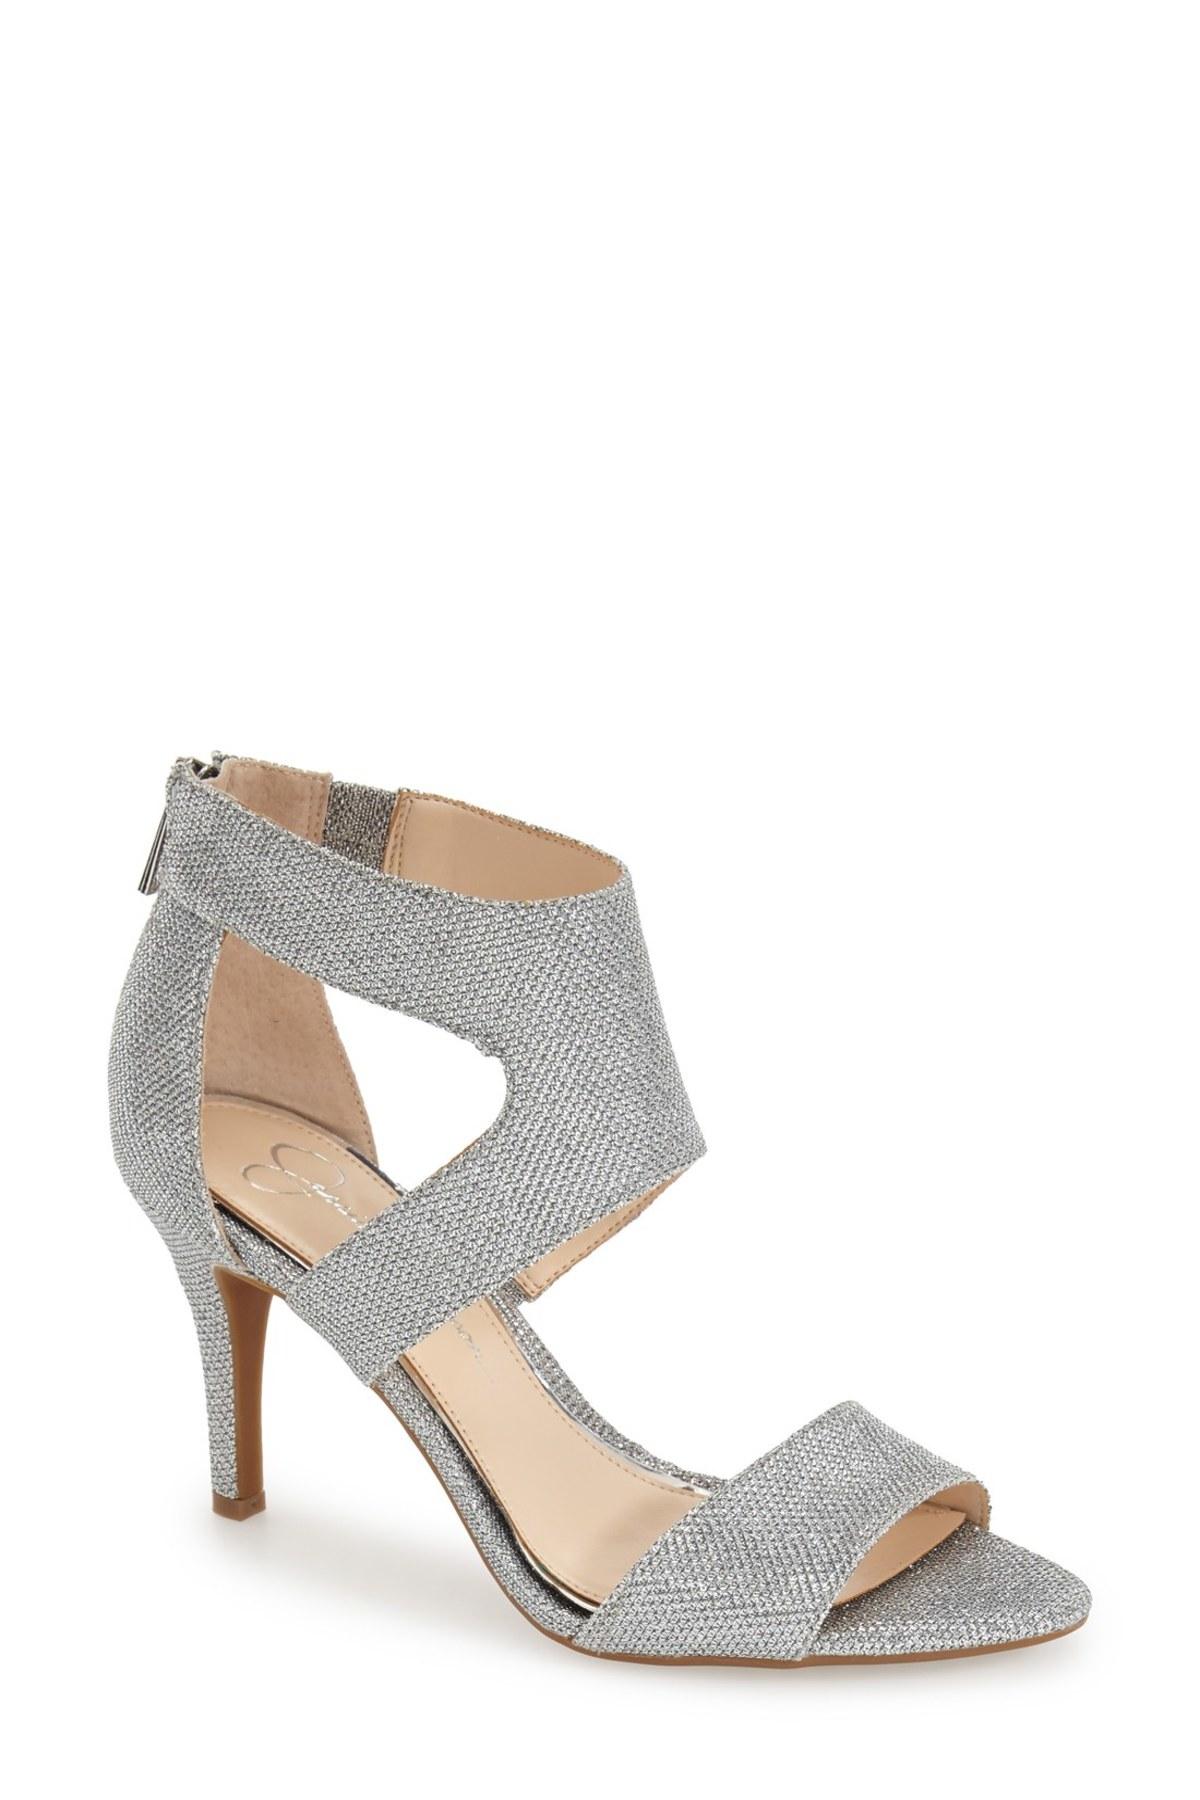 Lyst - Jessica simpson Mekos Open Toe Sandal in Metallic